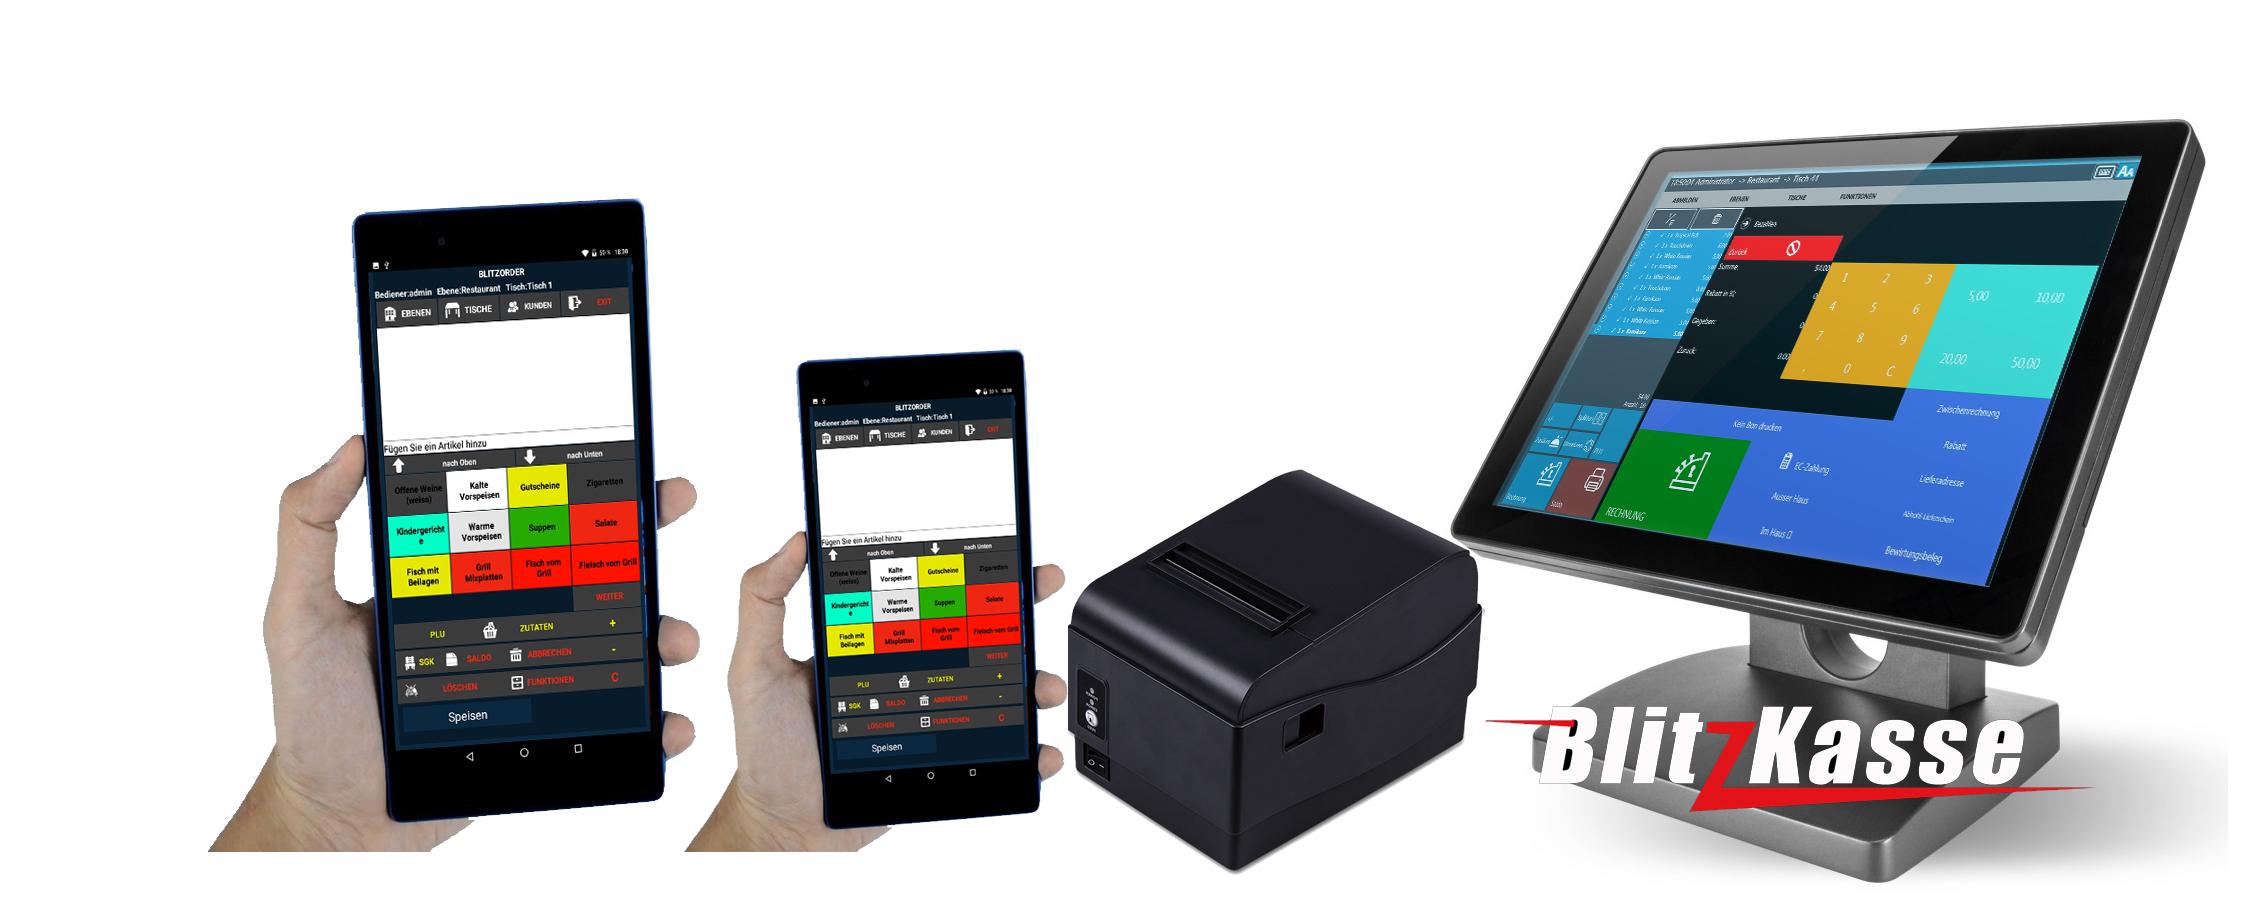 Blitz!Kasse TSE, INSIKA 2020 konforme KAssensysteme ab jetzt..